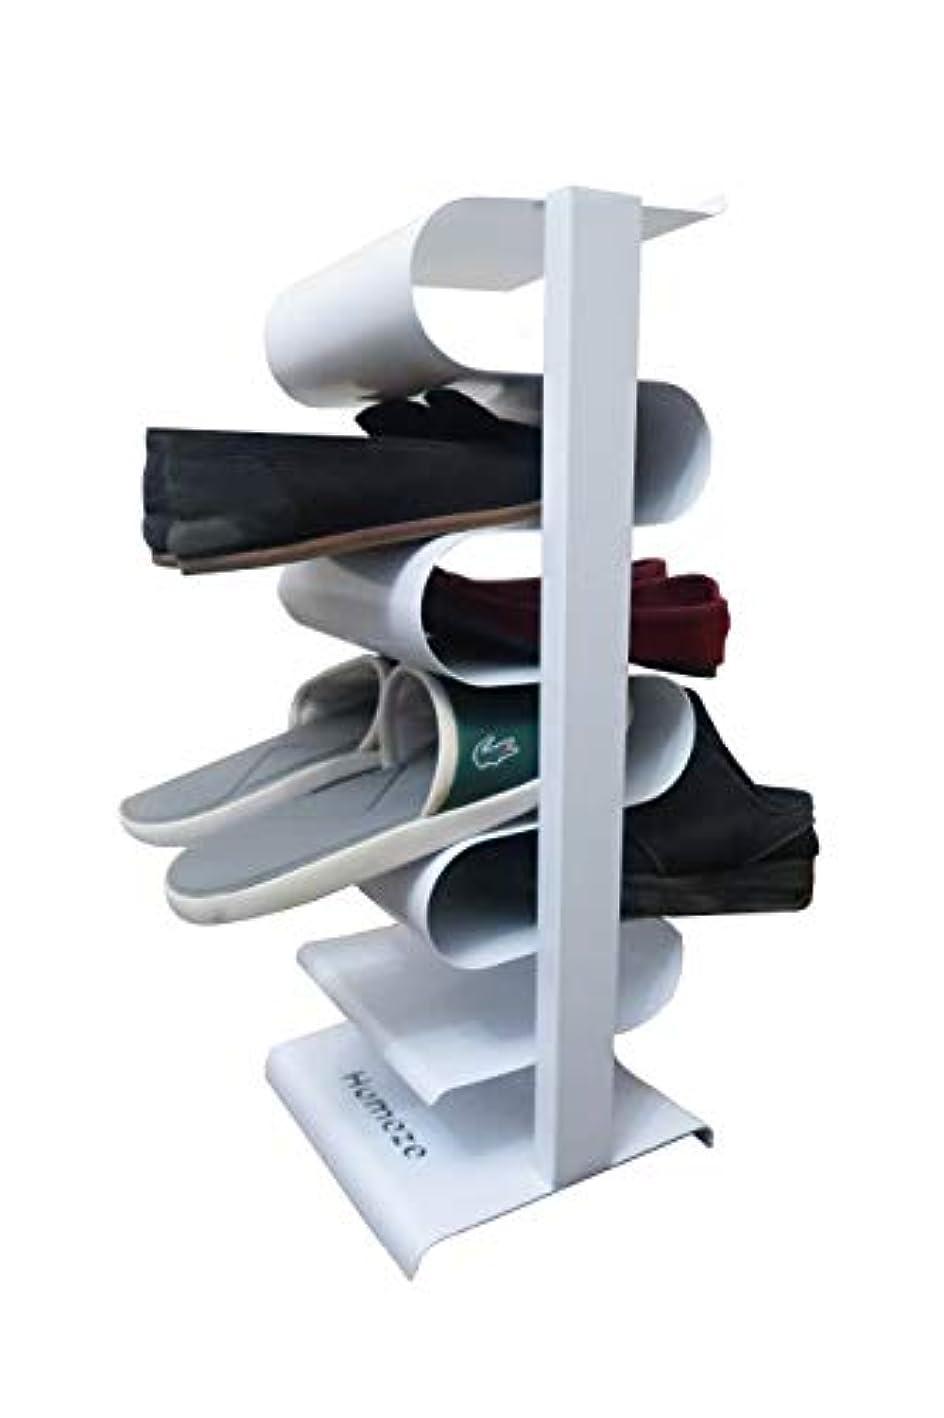 Homeze Free Standing Shoe Rack (White Gloss)